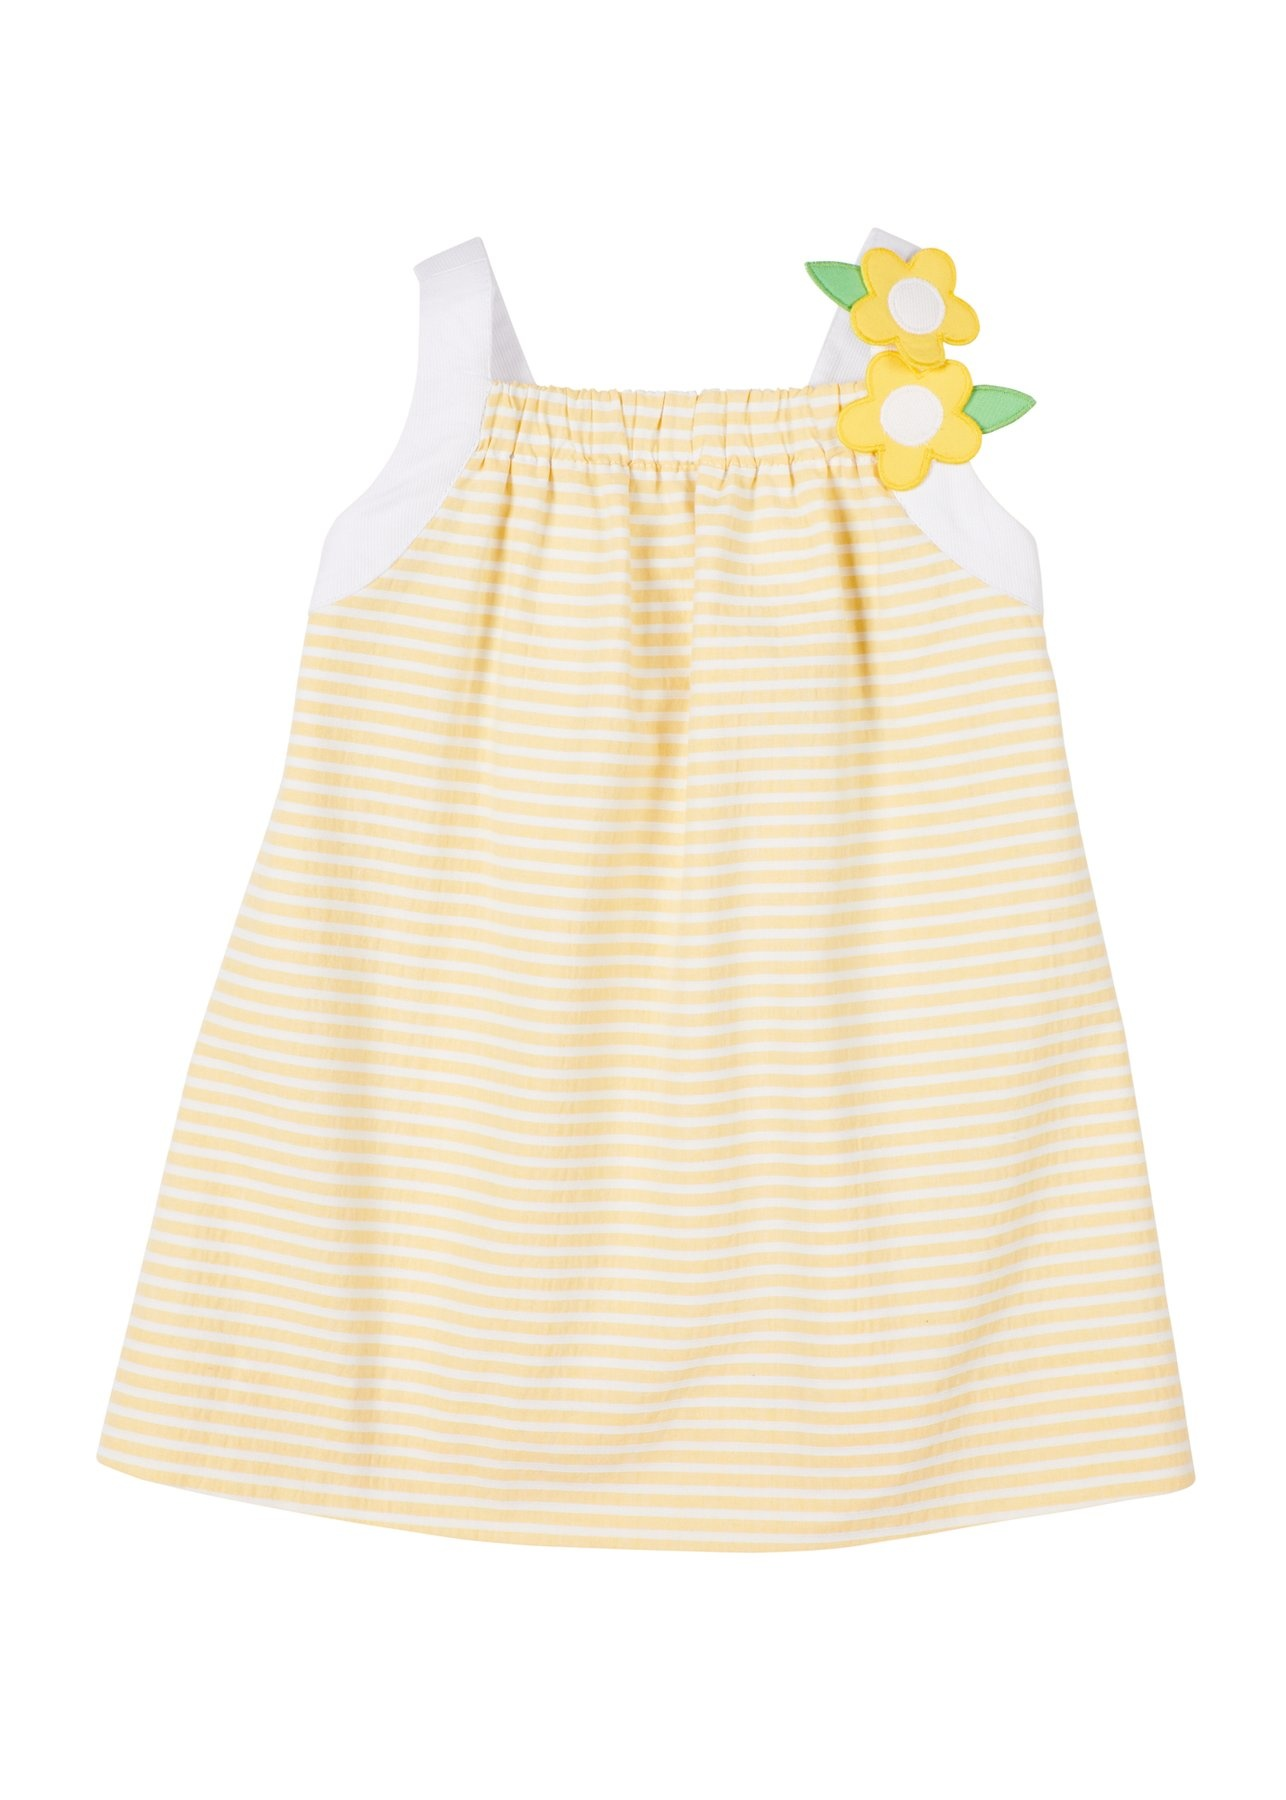 Florence Eiseman Yellow Stripe Sundress